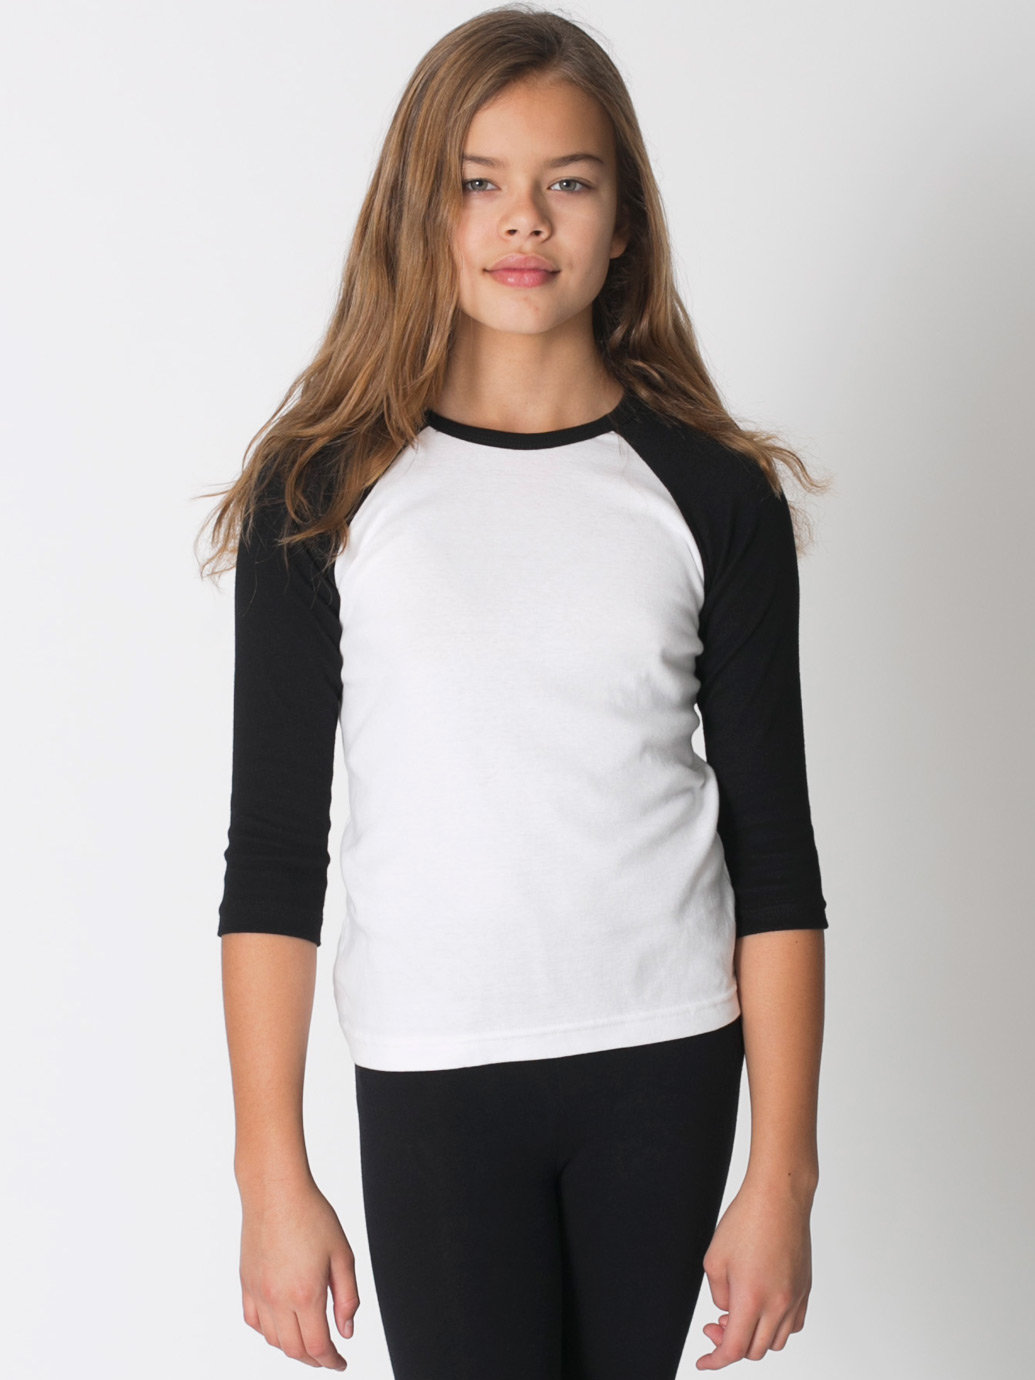 Black t shirt for babies - 10 Colors